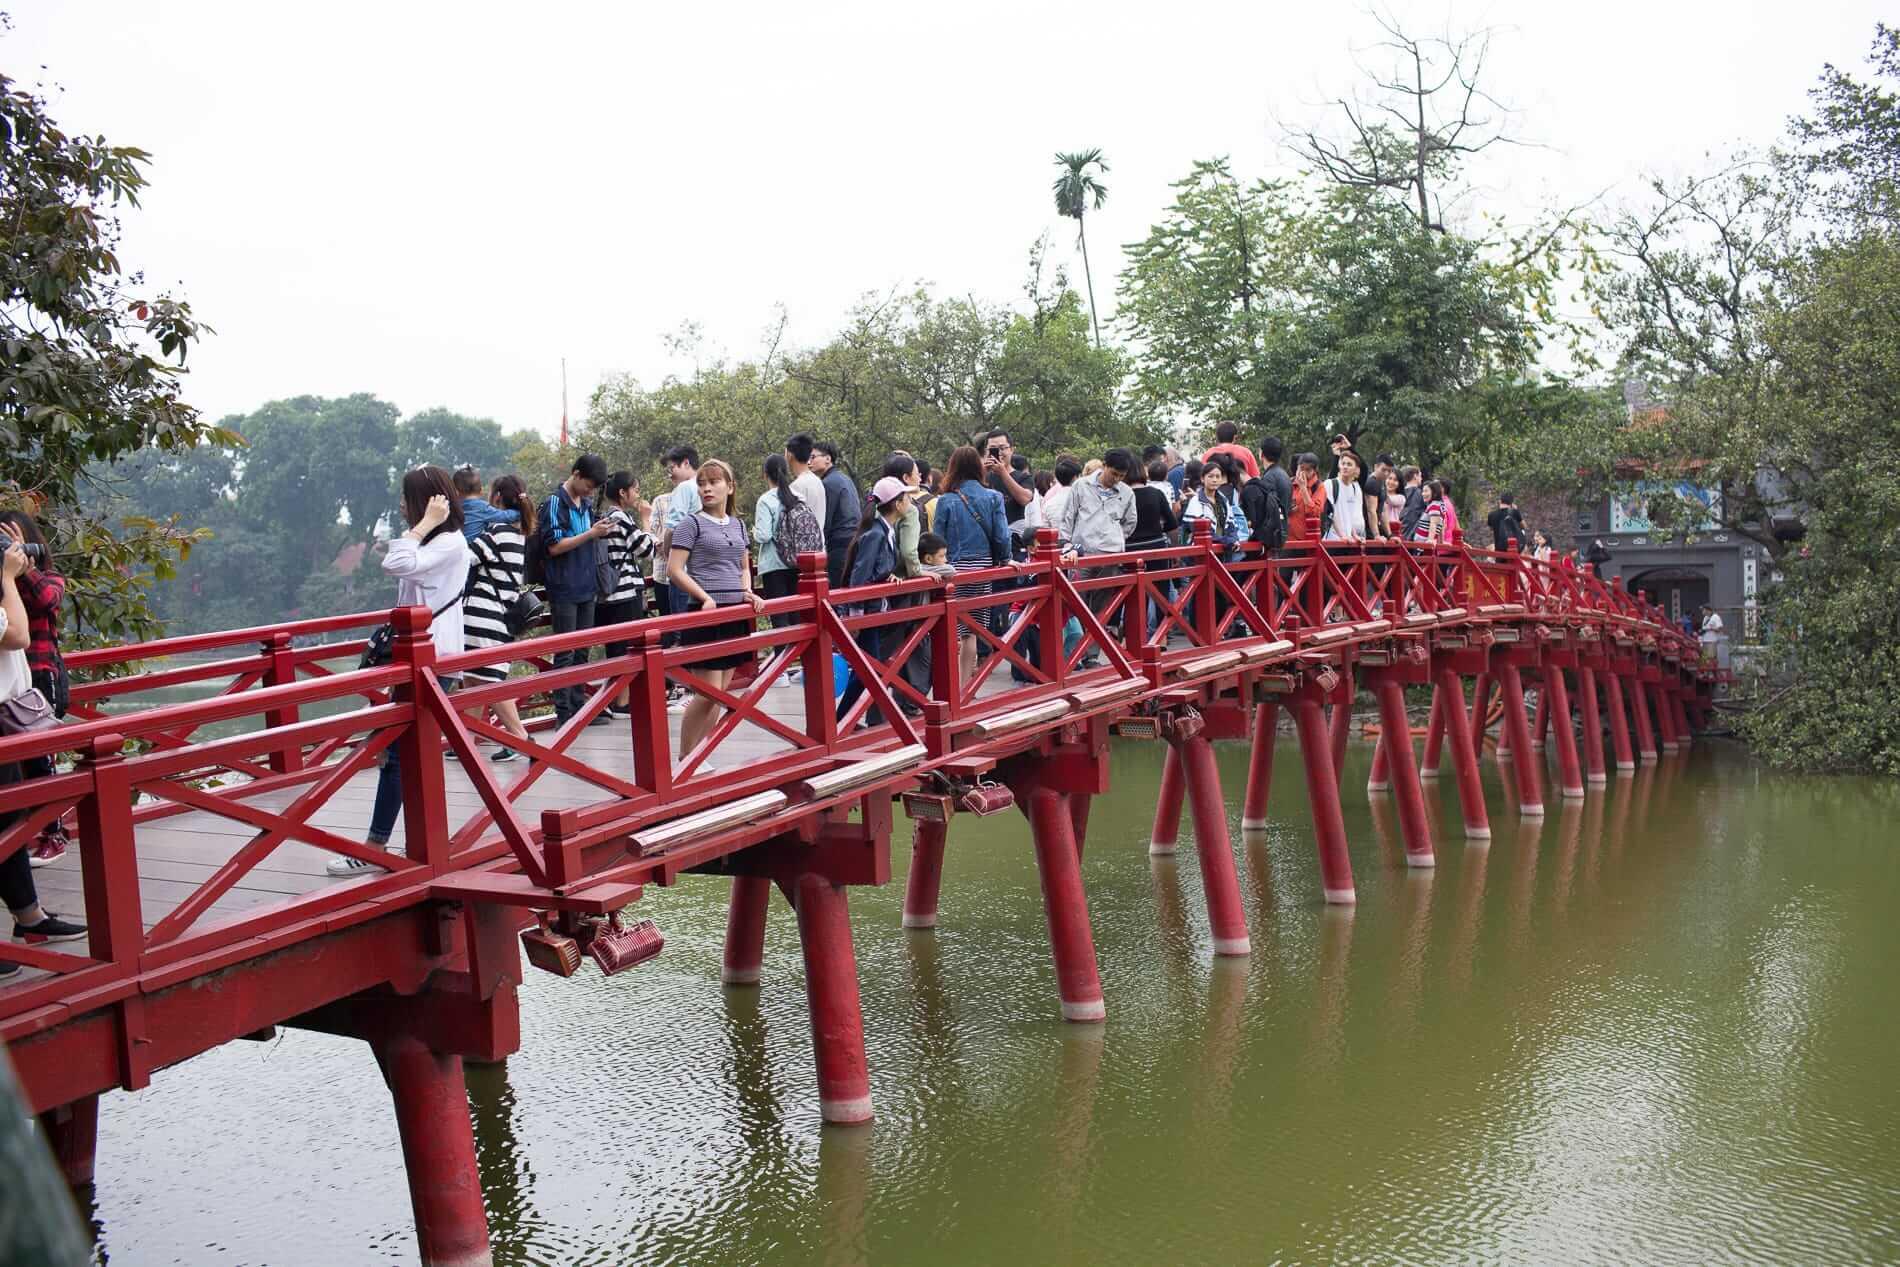 travelers on the little red bridge on Hoan Kiem Lake